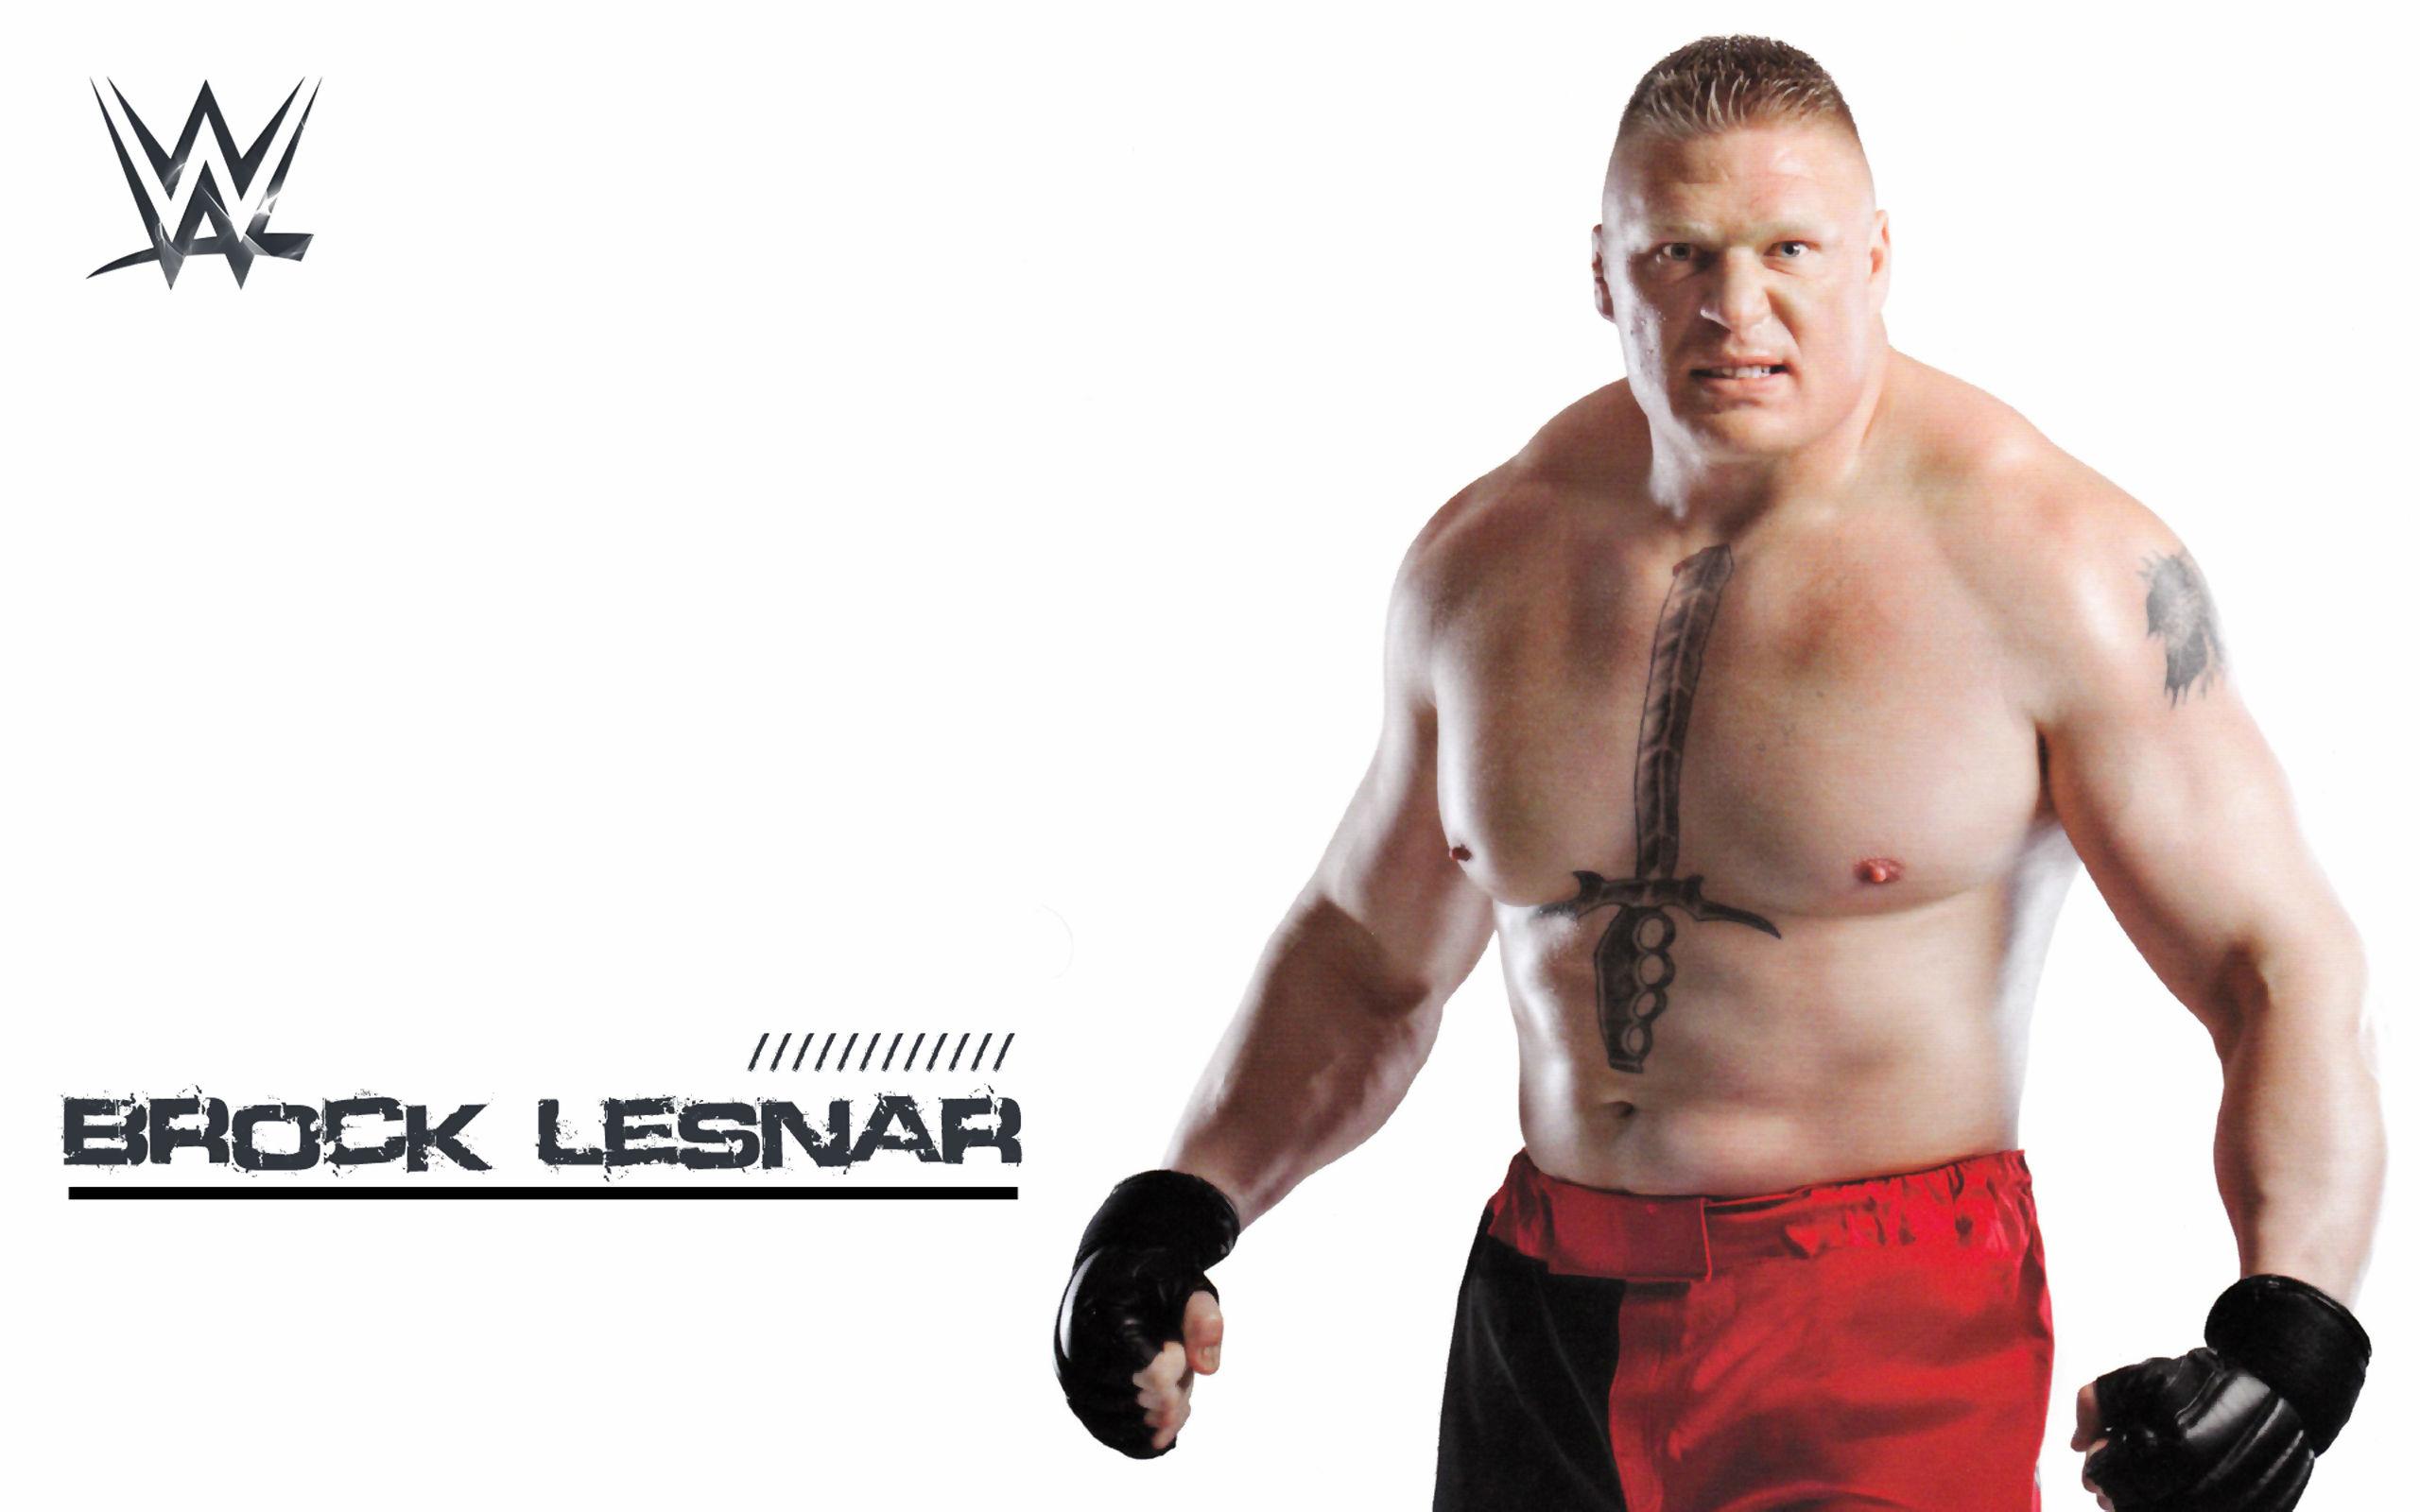 Download WWE HD wallpaper in laptop and desktop